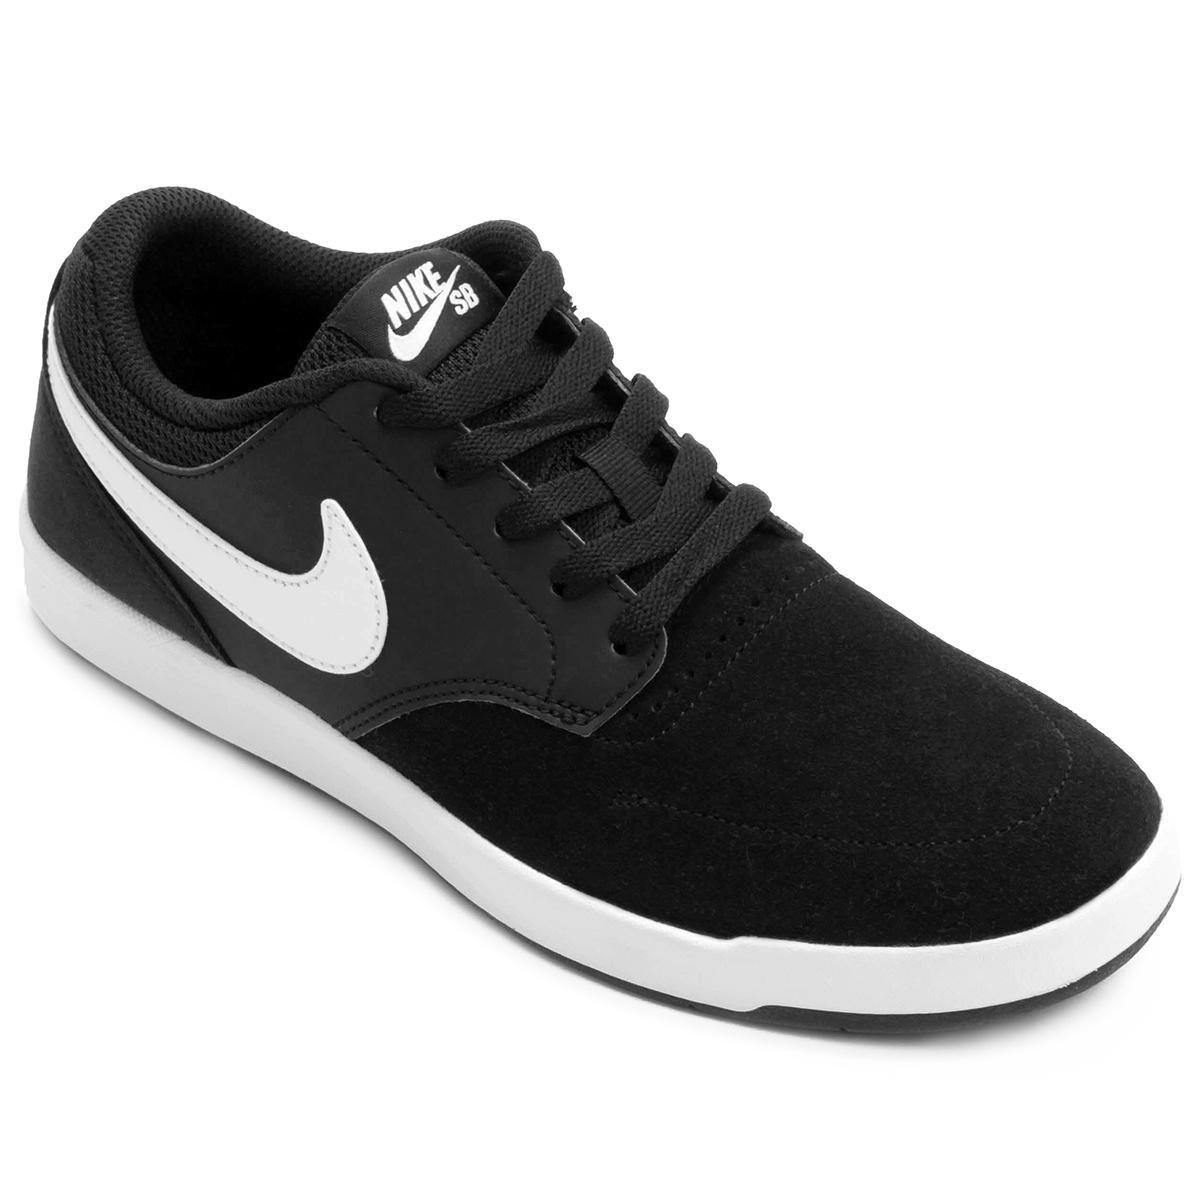 b8feeb7cd Tênis Couro Nike SB Fokus Masculina - Compre Agora